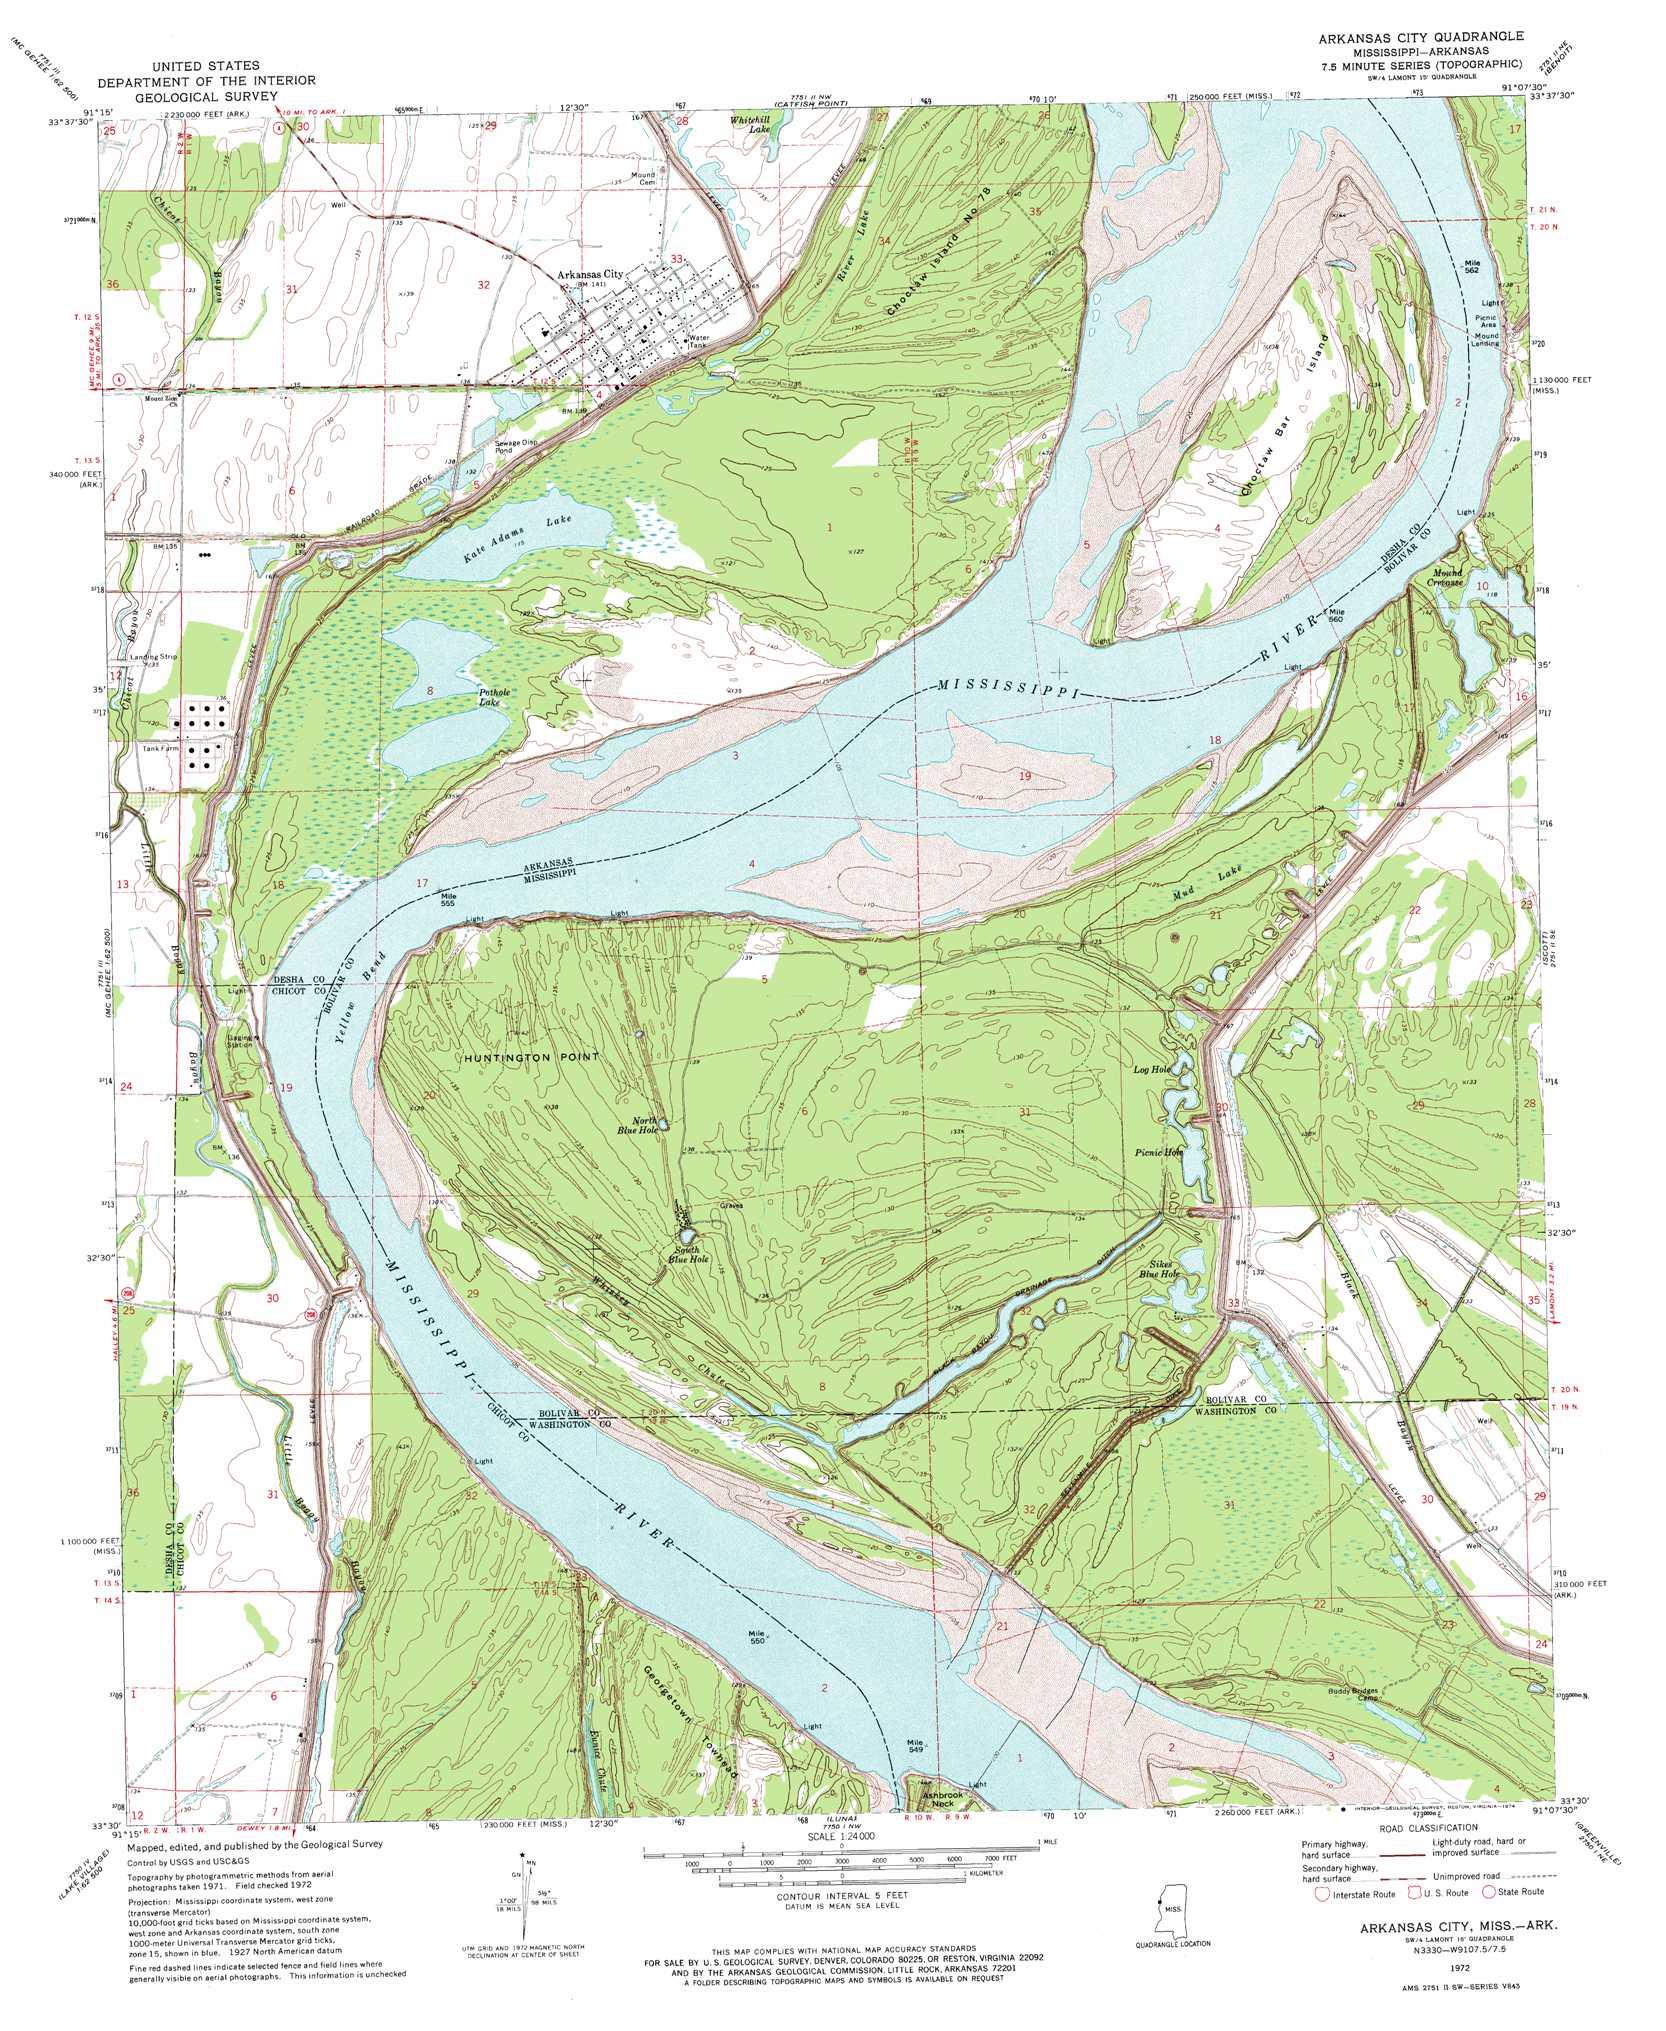 Arkansas City topographic map, AR, MS - USGS Topo Quad 33091e2